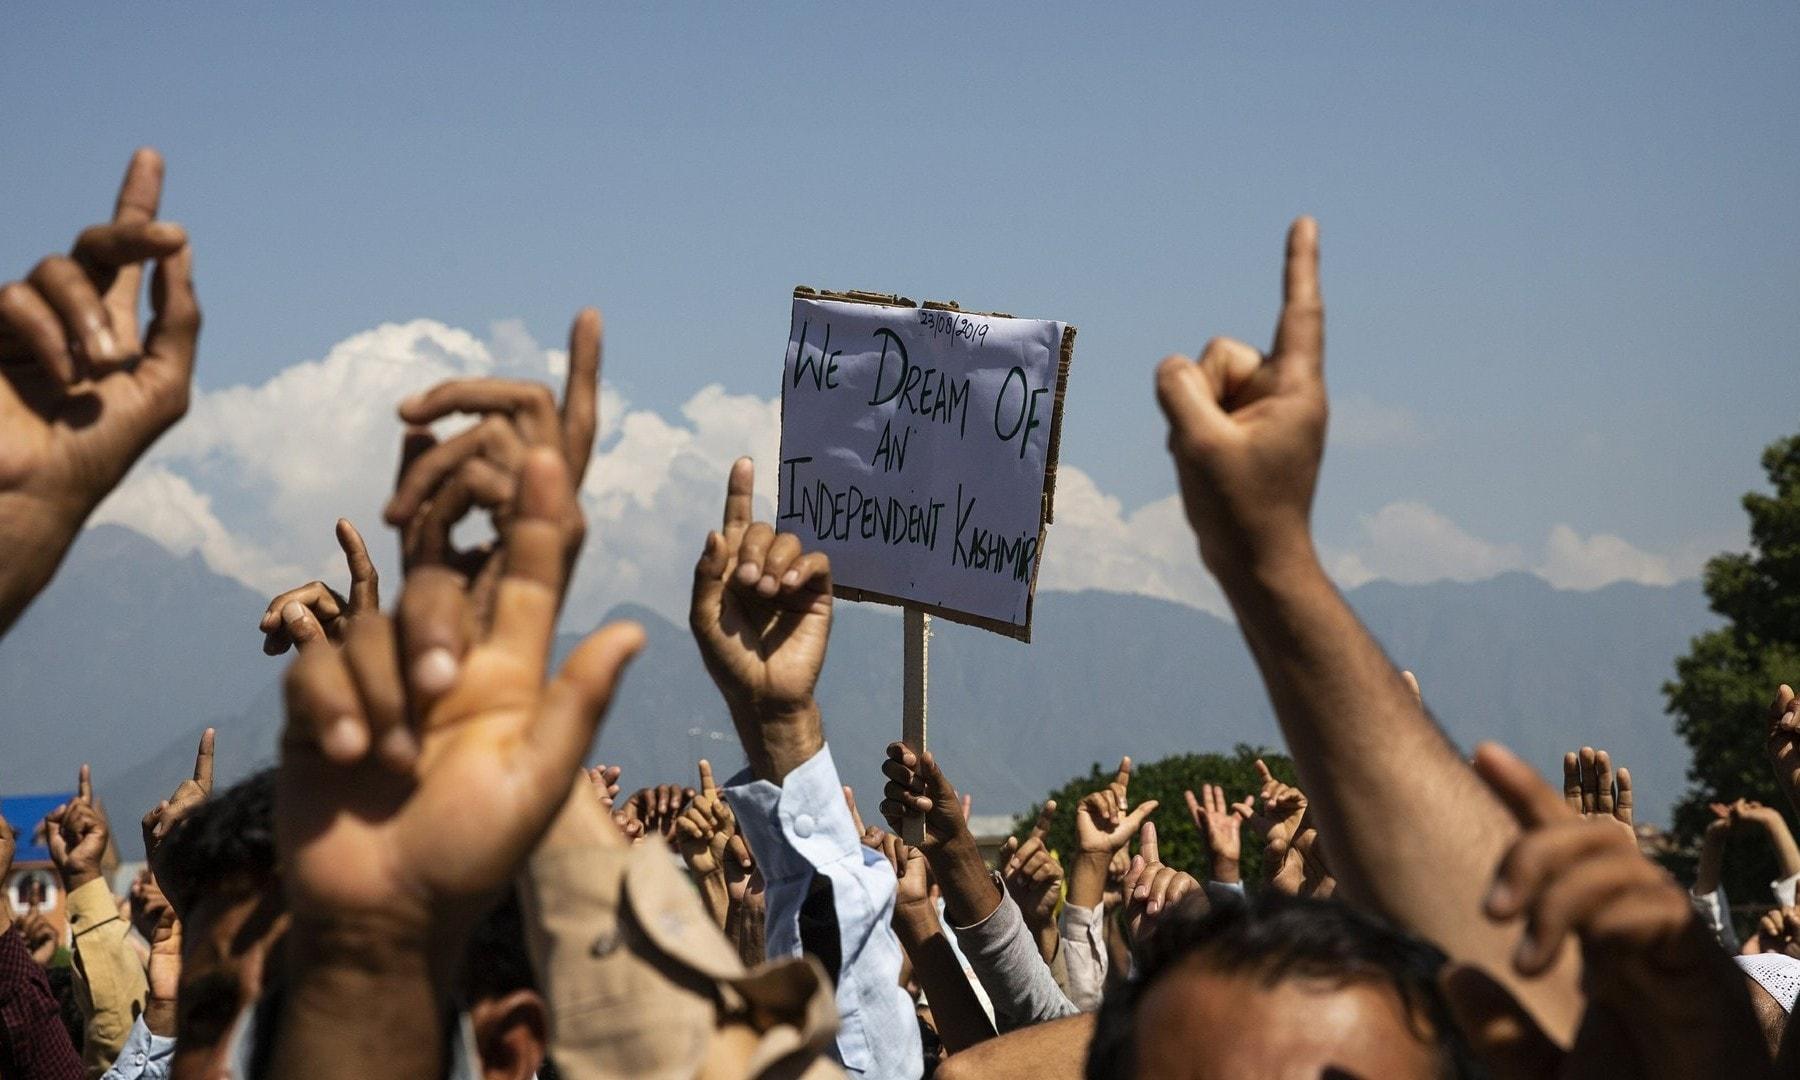 Kashmiri men shout freedom slogans during a protest against New Delhi's tightened grip on the region on August 23, 2019. — AP/Dar Yasin